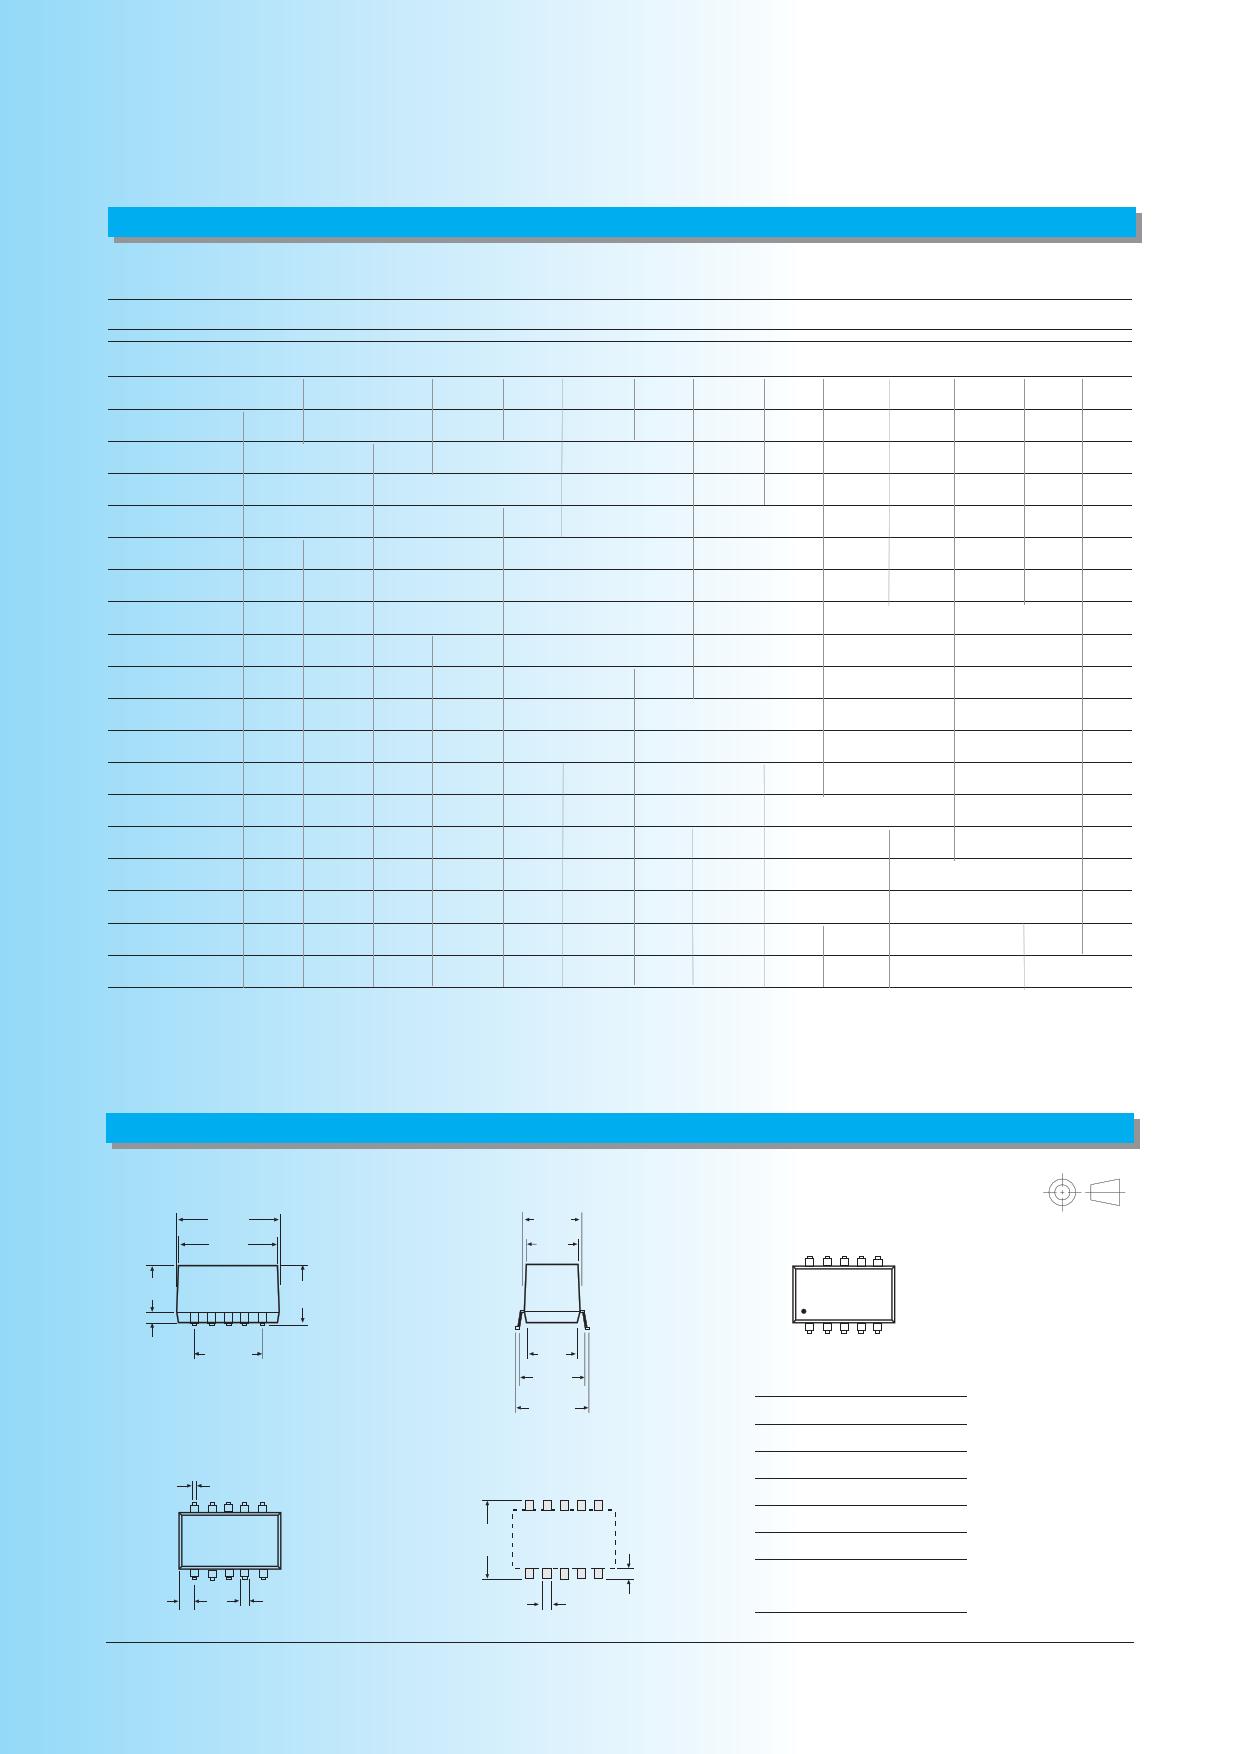 R-78A1.5-0.5SMD pdf